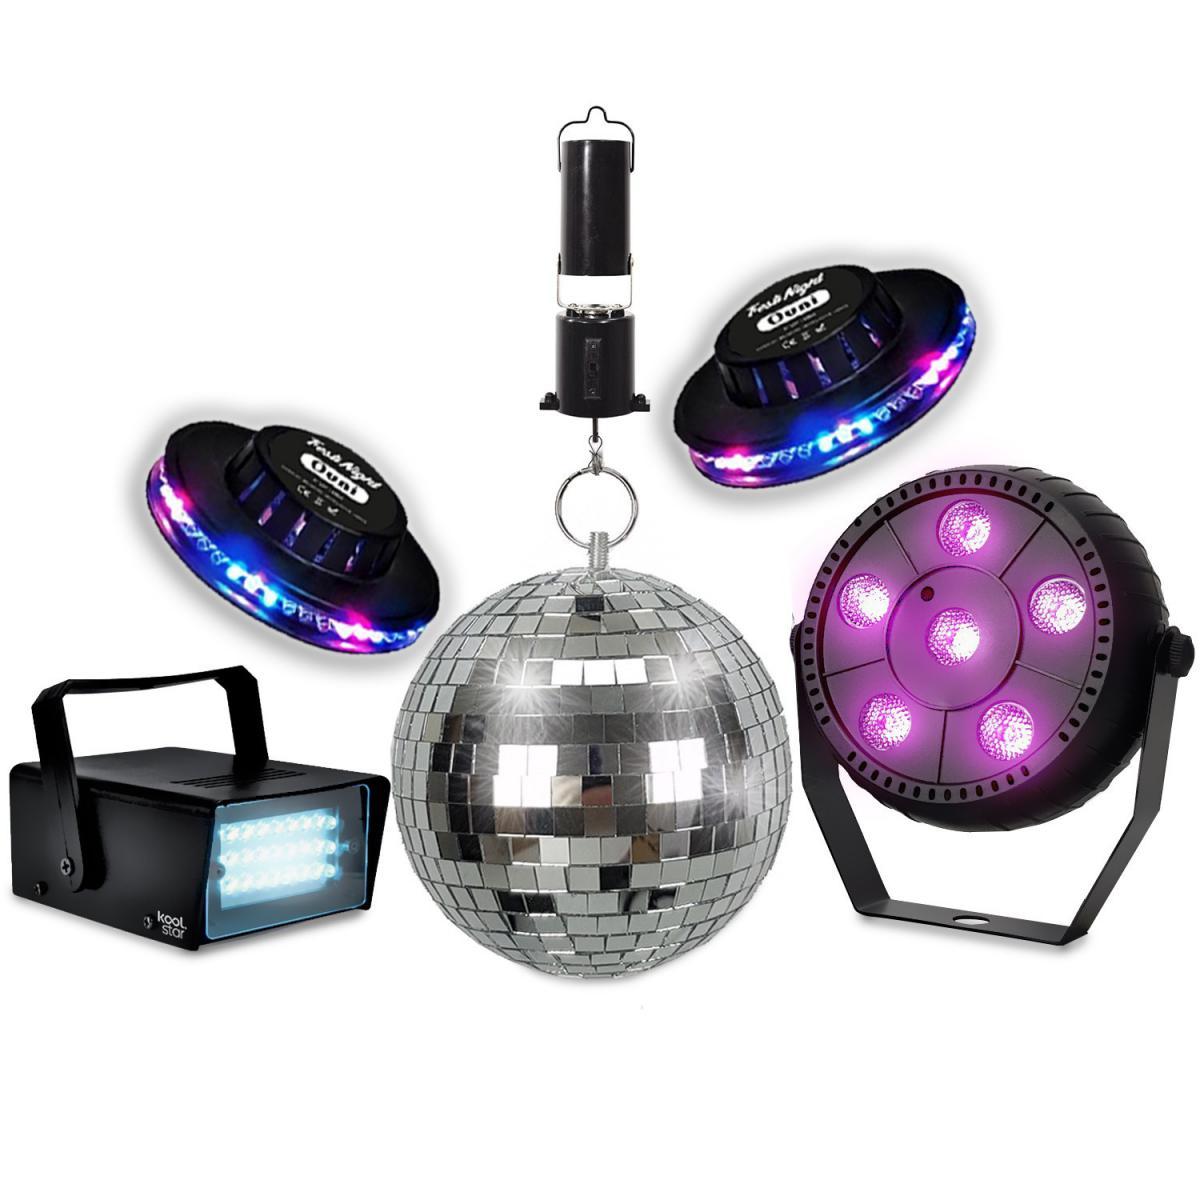 Koolstar Pack lumières KOOLSTAR PACKDISCO Mini Strobe 24 LED - PAR SLIM 6 LED + 2x Soucoupes OVNI - Boule à facettes 16cm + Moteu